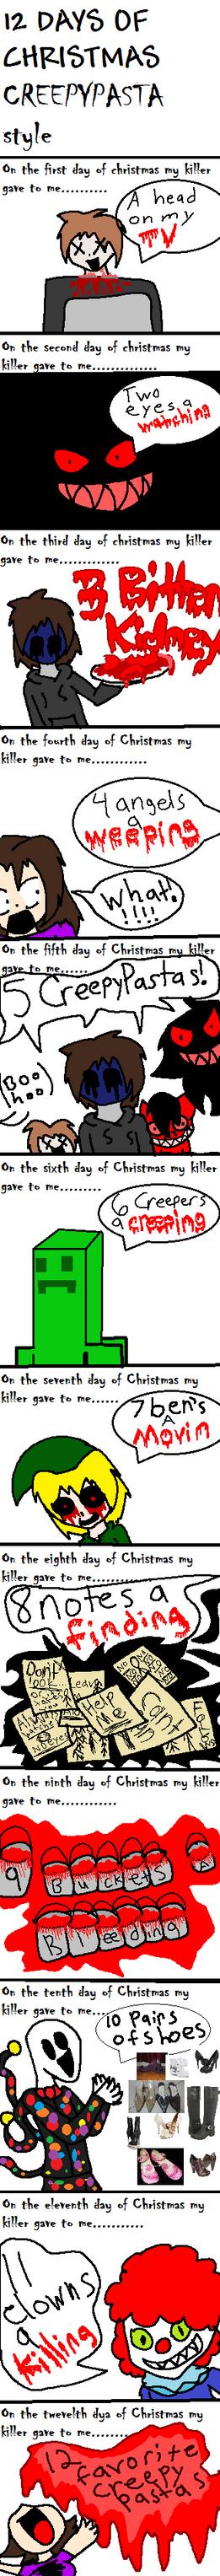 12 days of Christmas Creepypasta style by shadowlover40 on ...